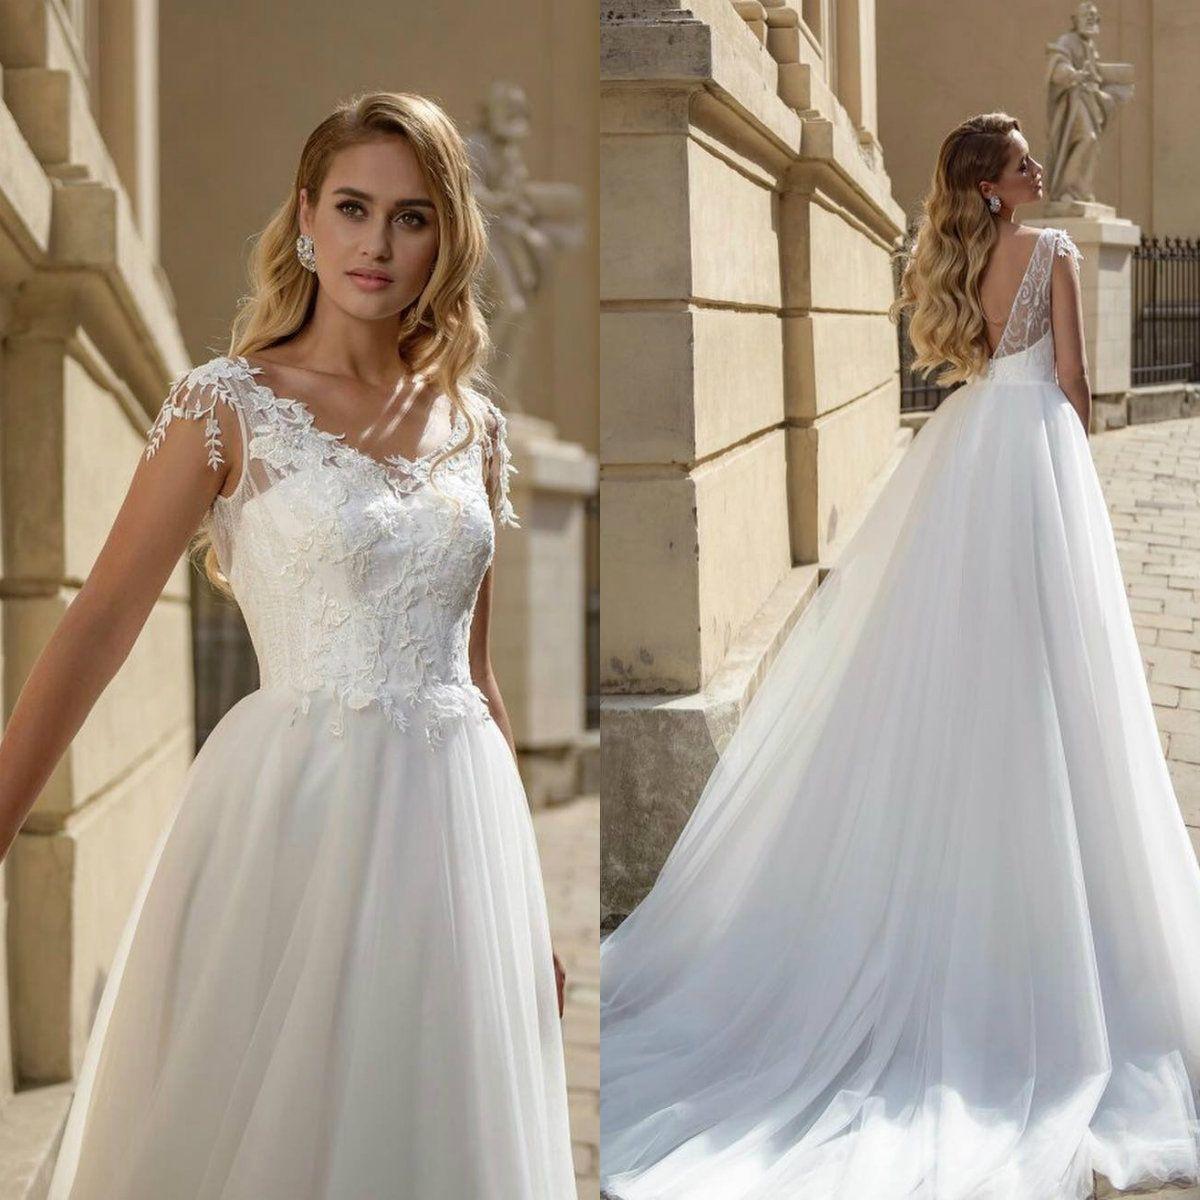 2020 A Line Vestido de Noiva mangas Backless Applique vestidos de casamento Tulle Sweep Trem Boho vestidos de noiva